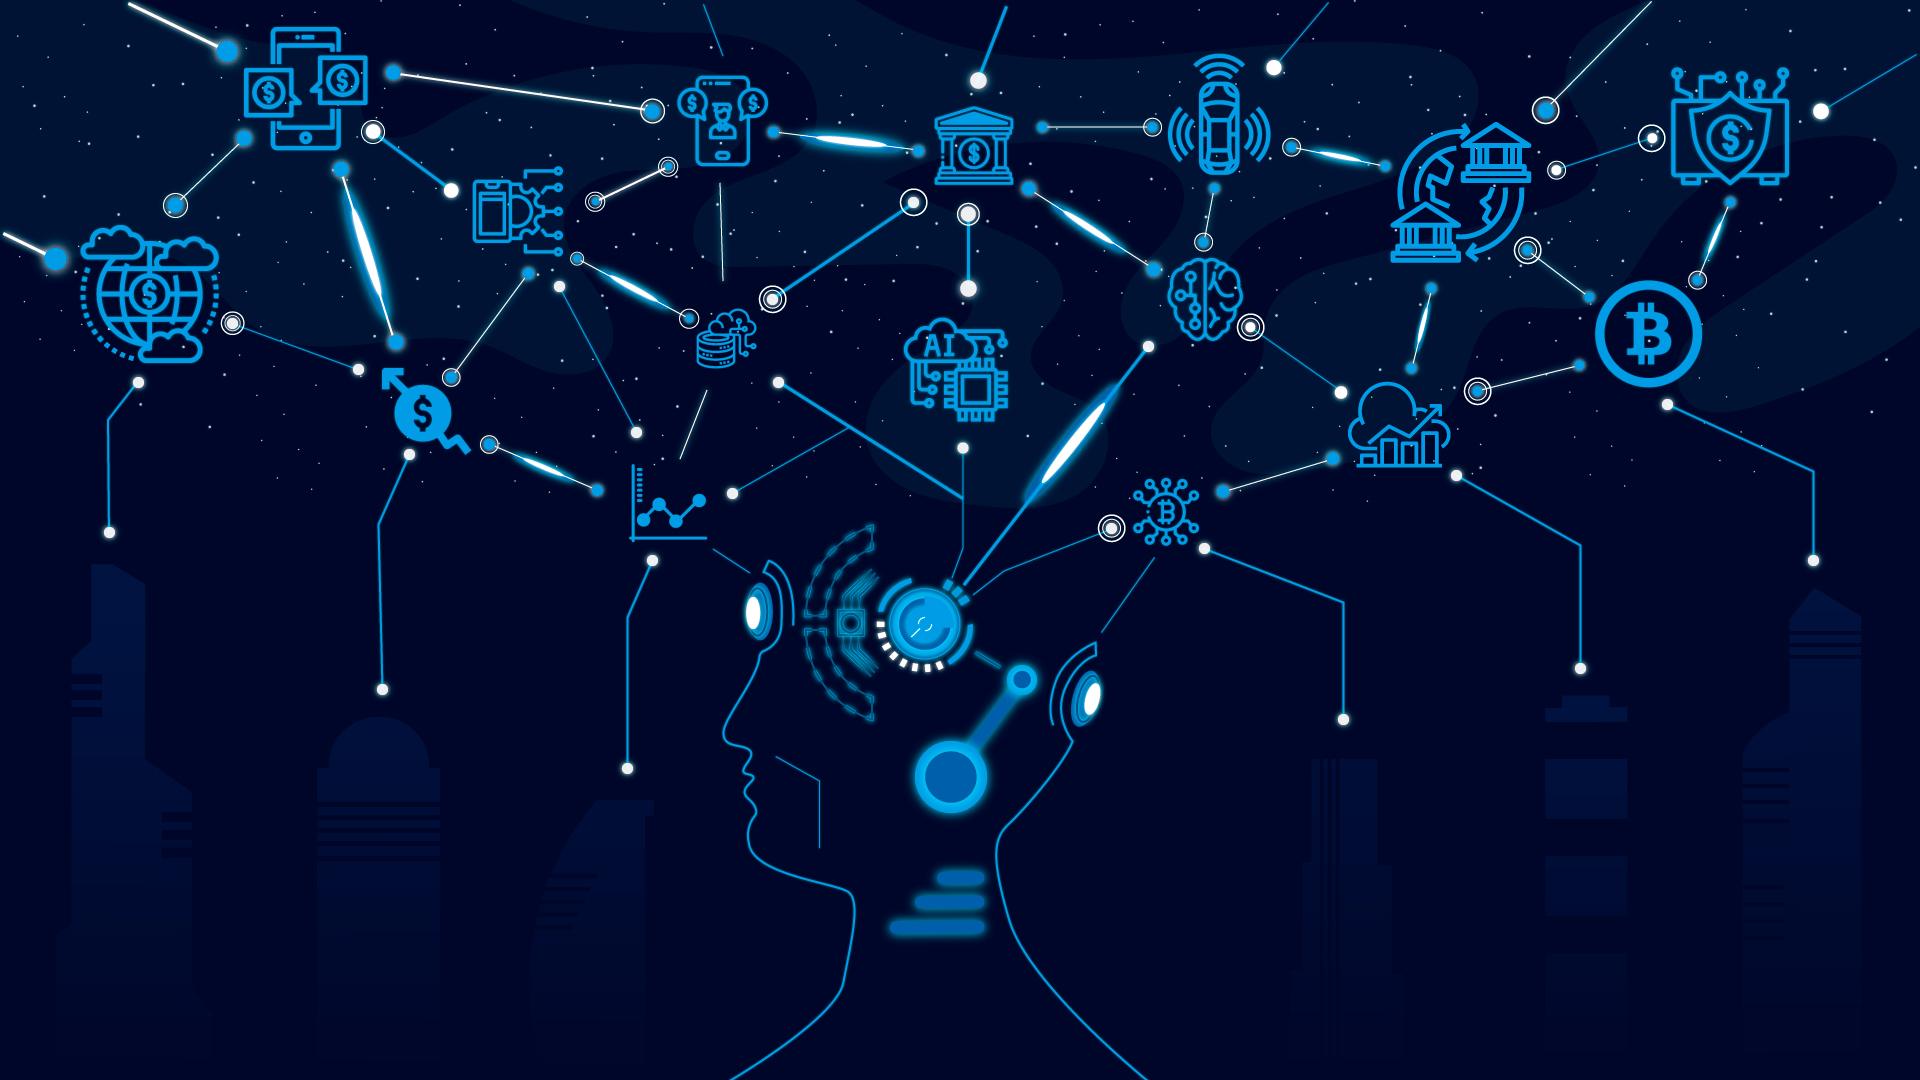 Deltec Bank, Bahamas explains - Unlocking Digital Transformation